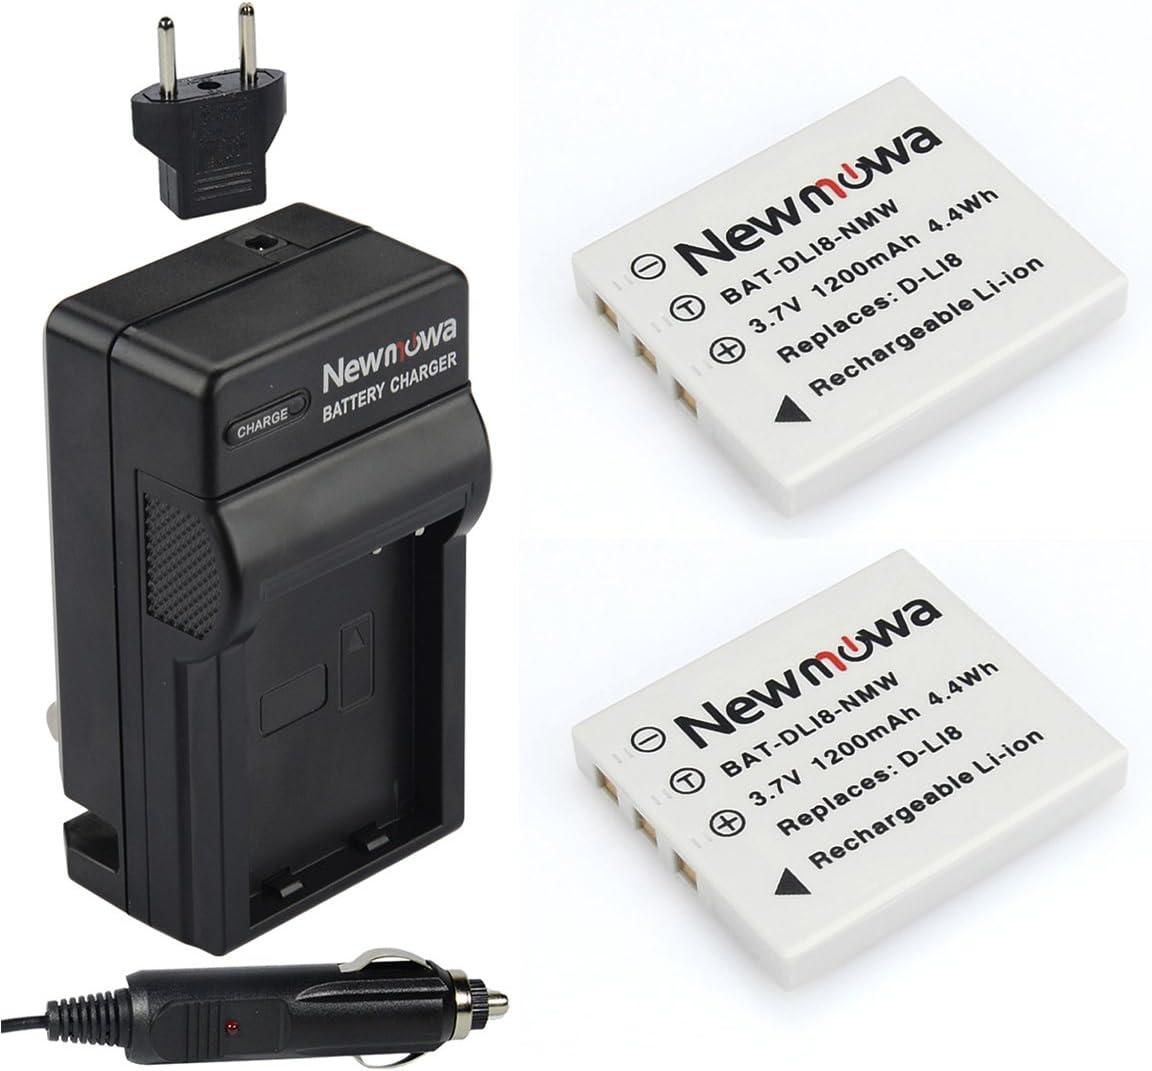 Newmowa D-Li8 Replacement Battery (2-Pack) and Charger Kit for Pentax D-LI8, D-LI85, D-L18 and Pentax Optio A10, A20, A30, A36, A40, L20, S, S4, S4i, S5i, S5n, S5z, S6, S7,Same as Fuji NP-40 Battery